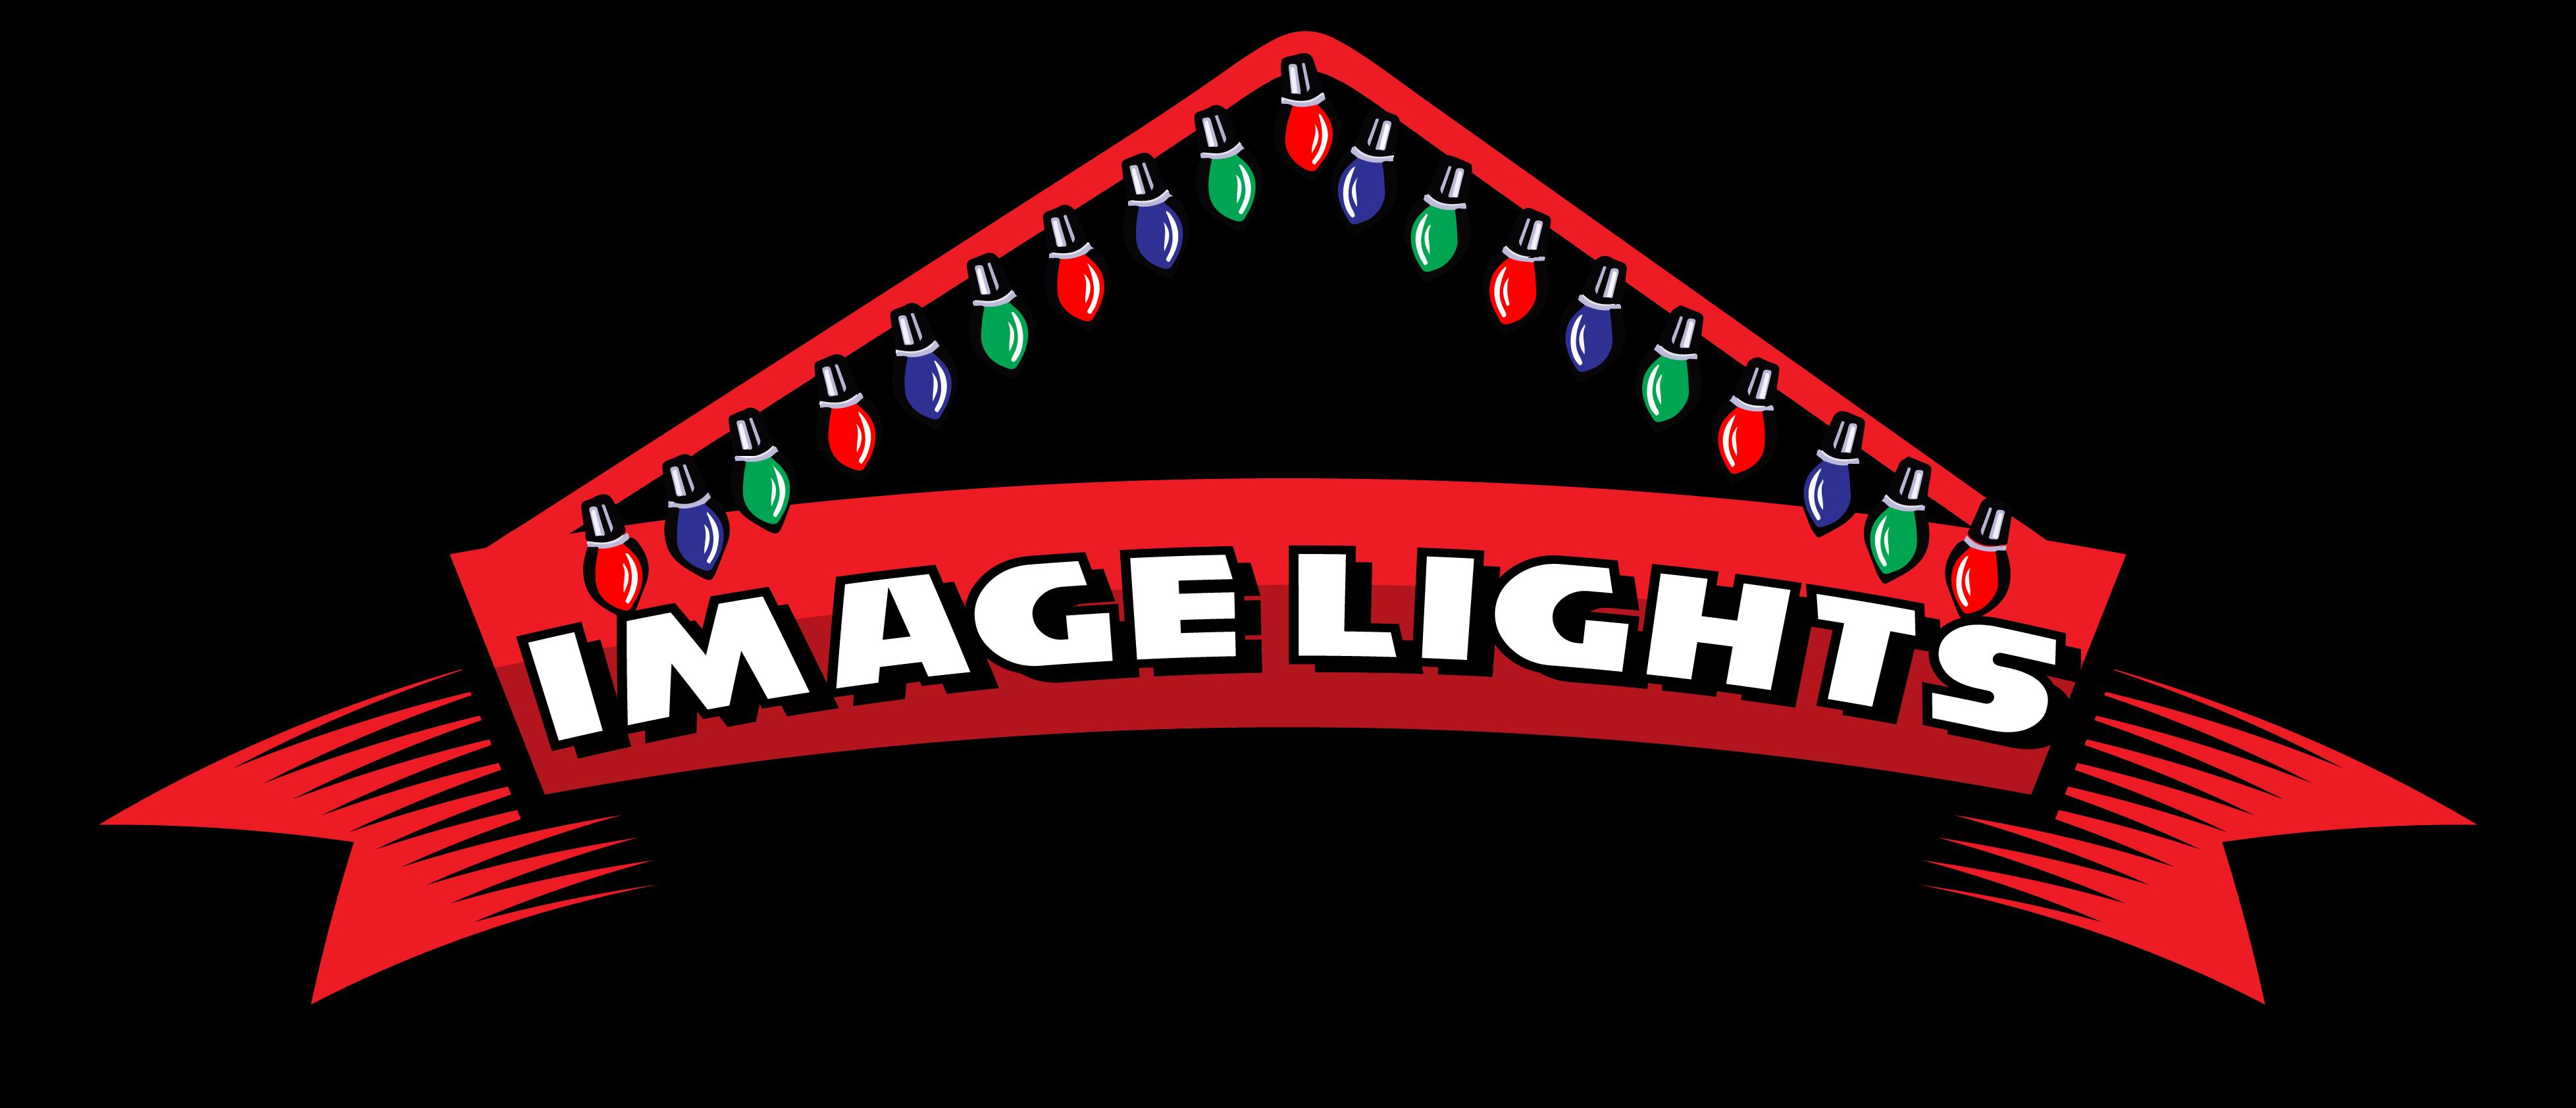 ImageLights